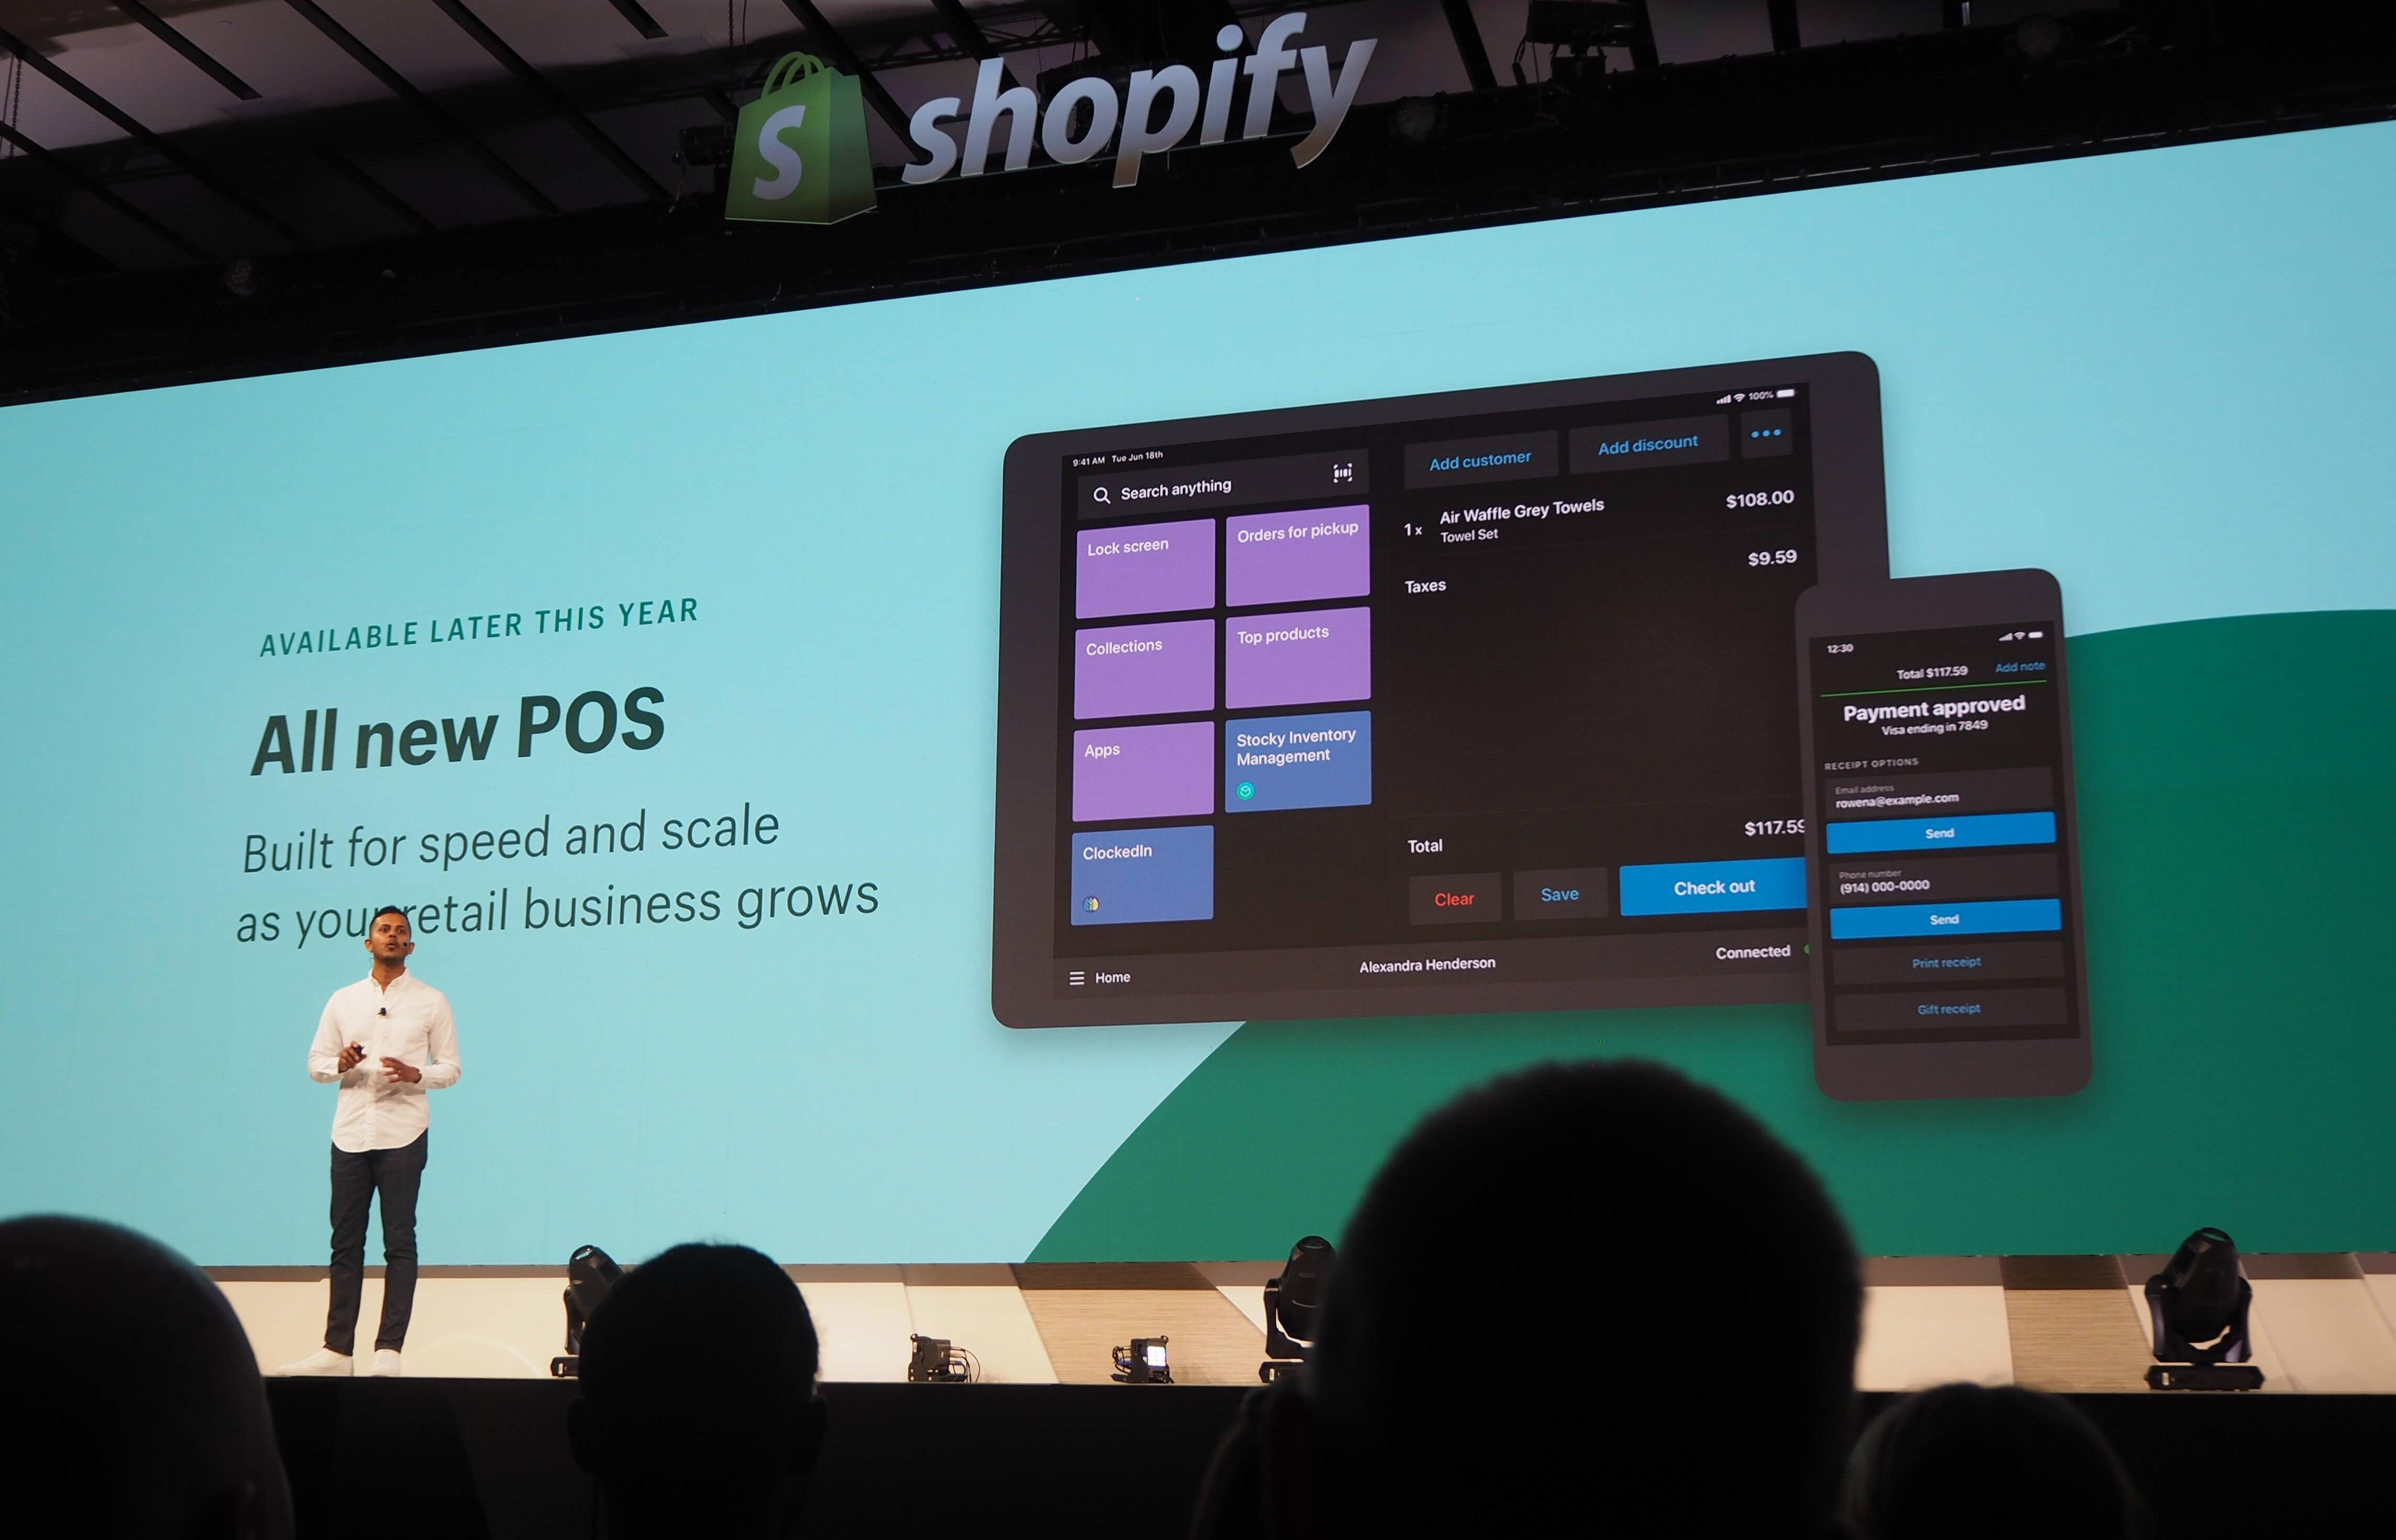 Shopify POSシステムを用いてオンラインとオフラインを融合